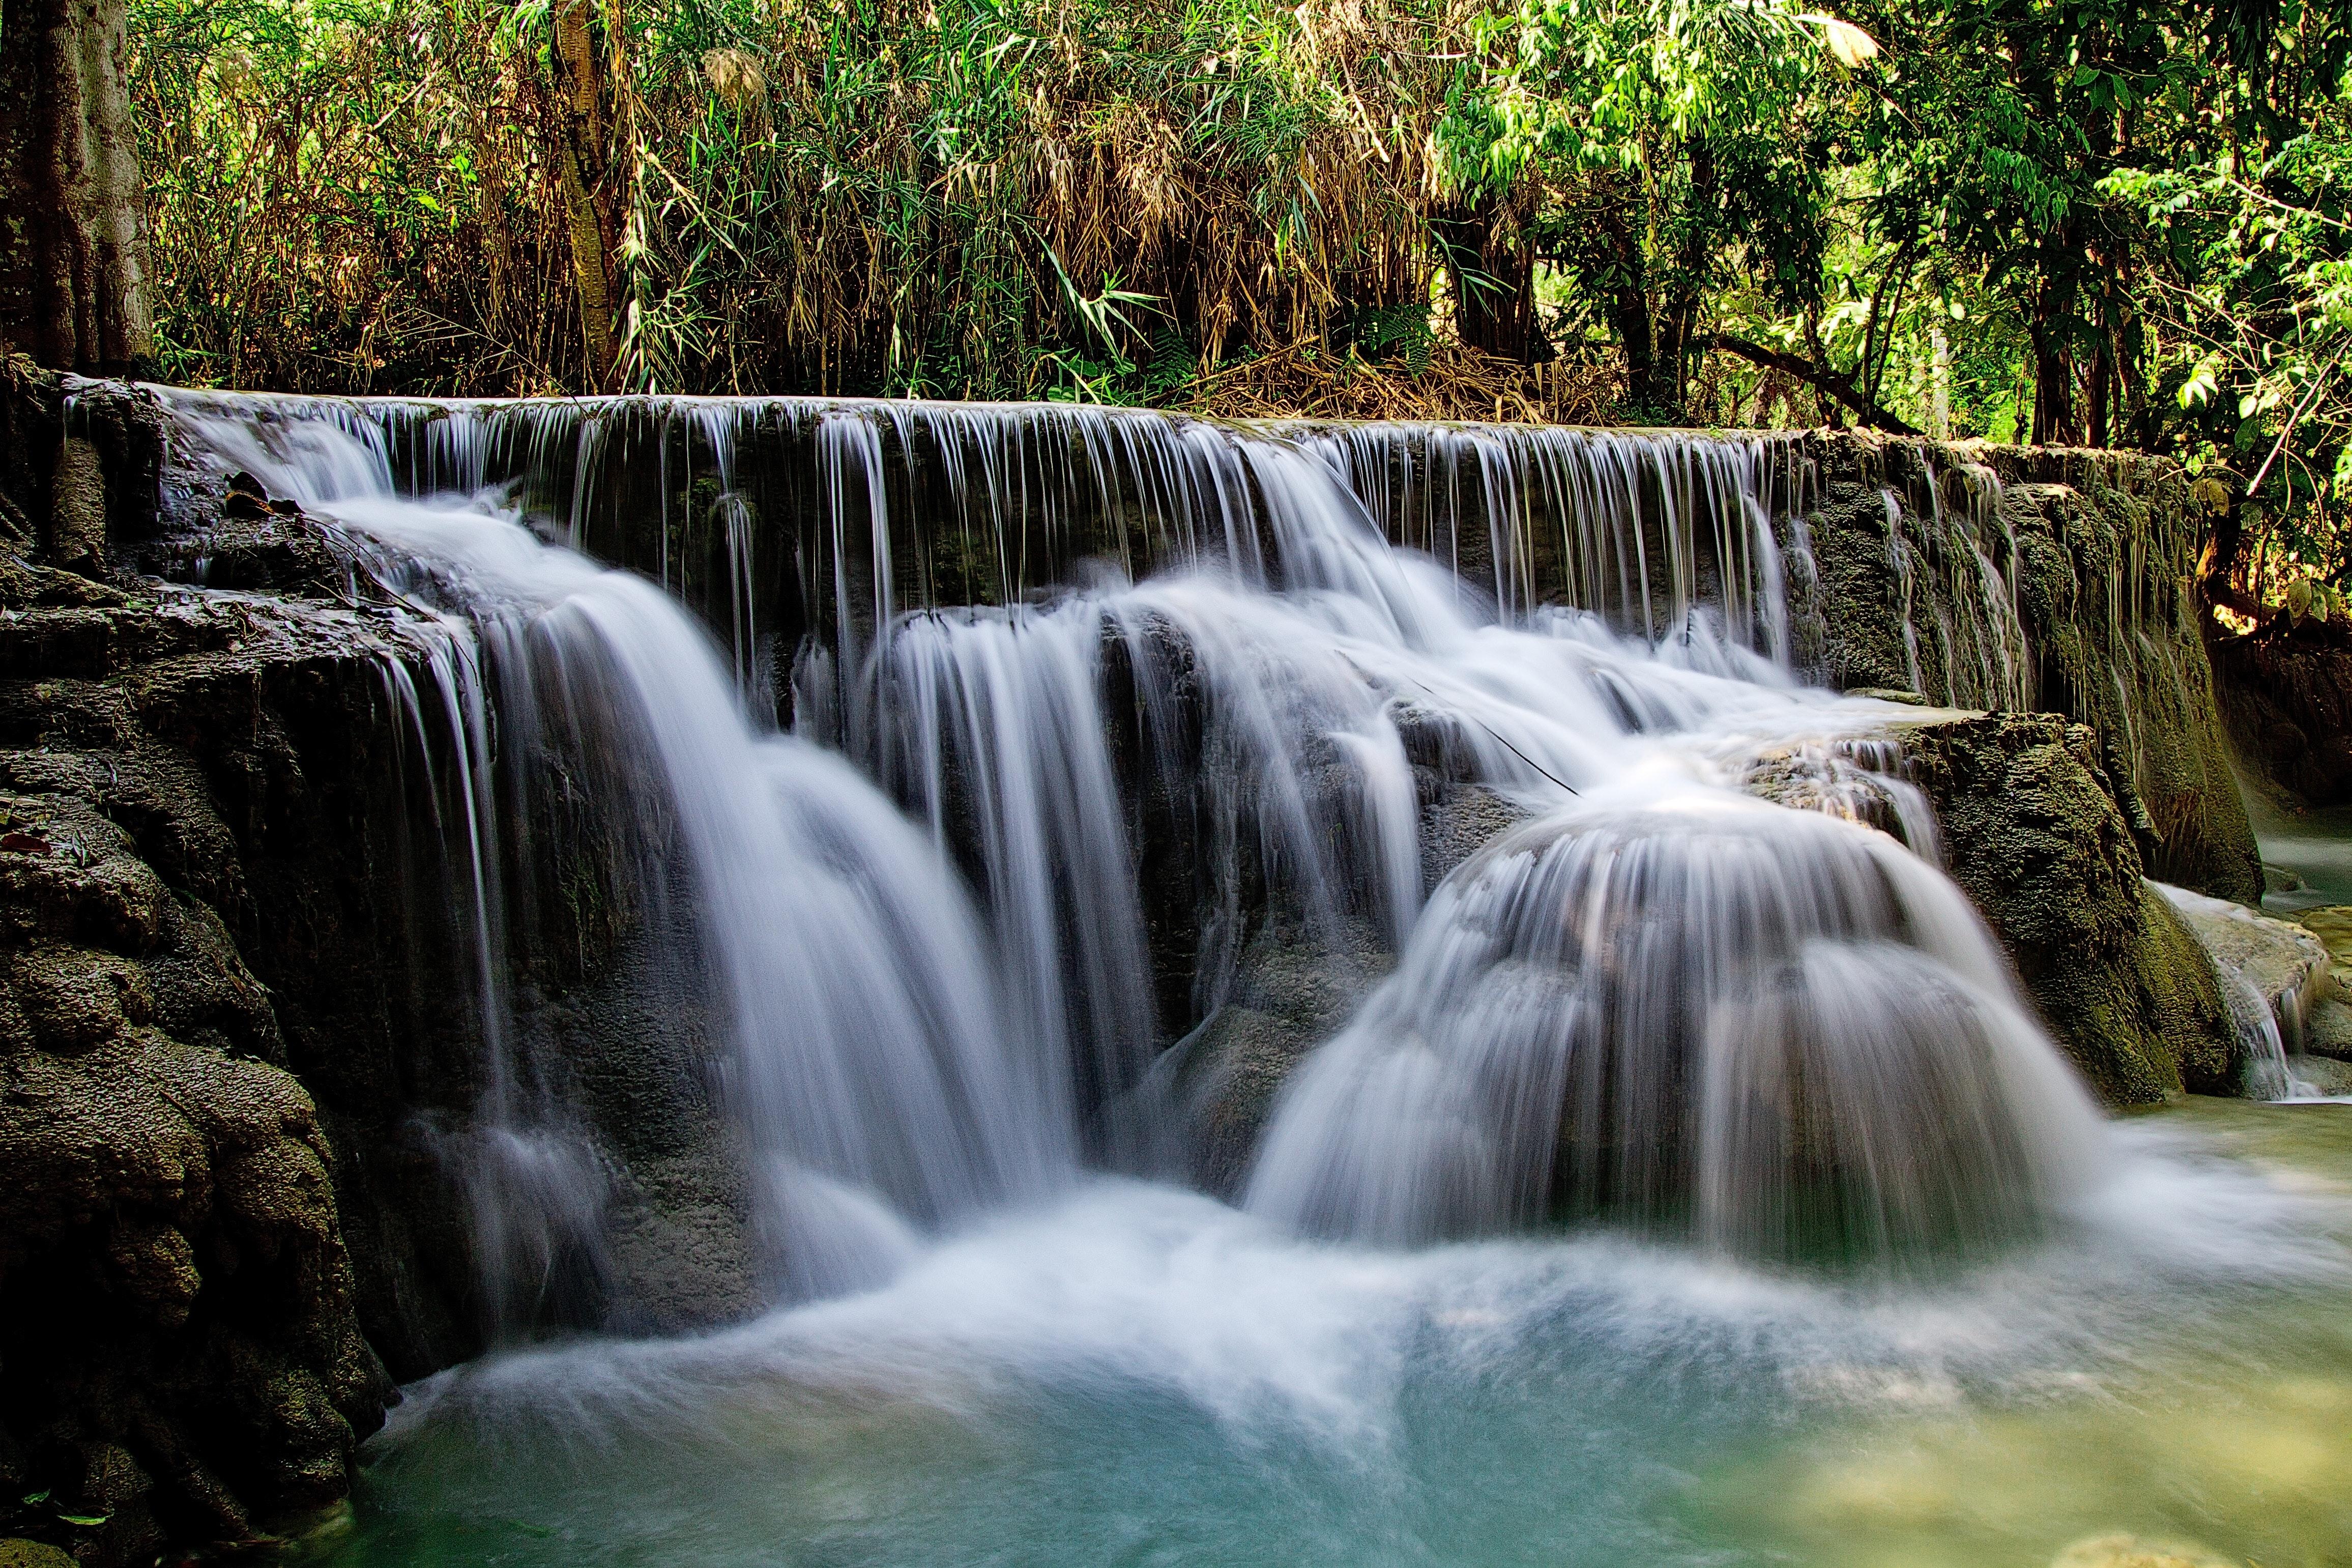 Waterfalls Beside Green Grass · Free Stock Photo